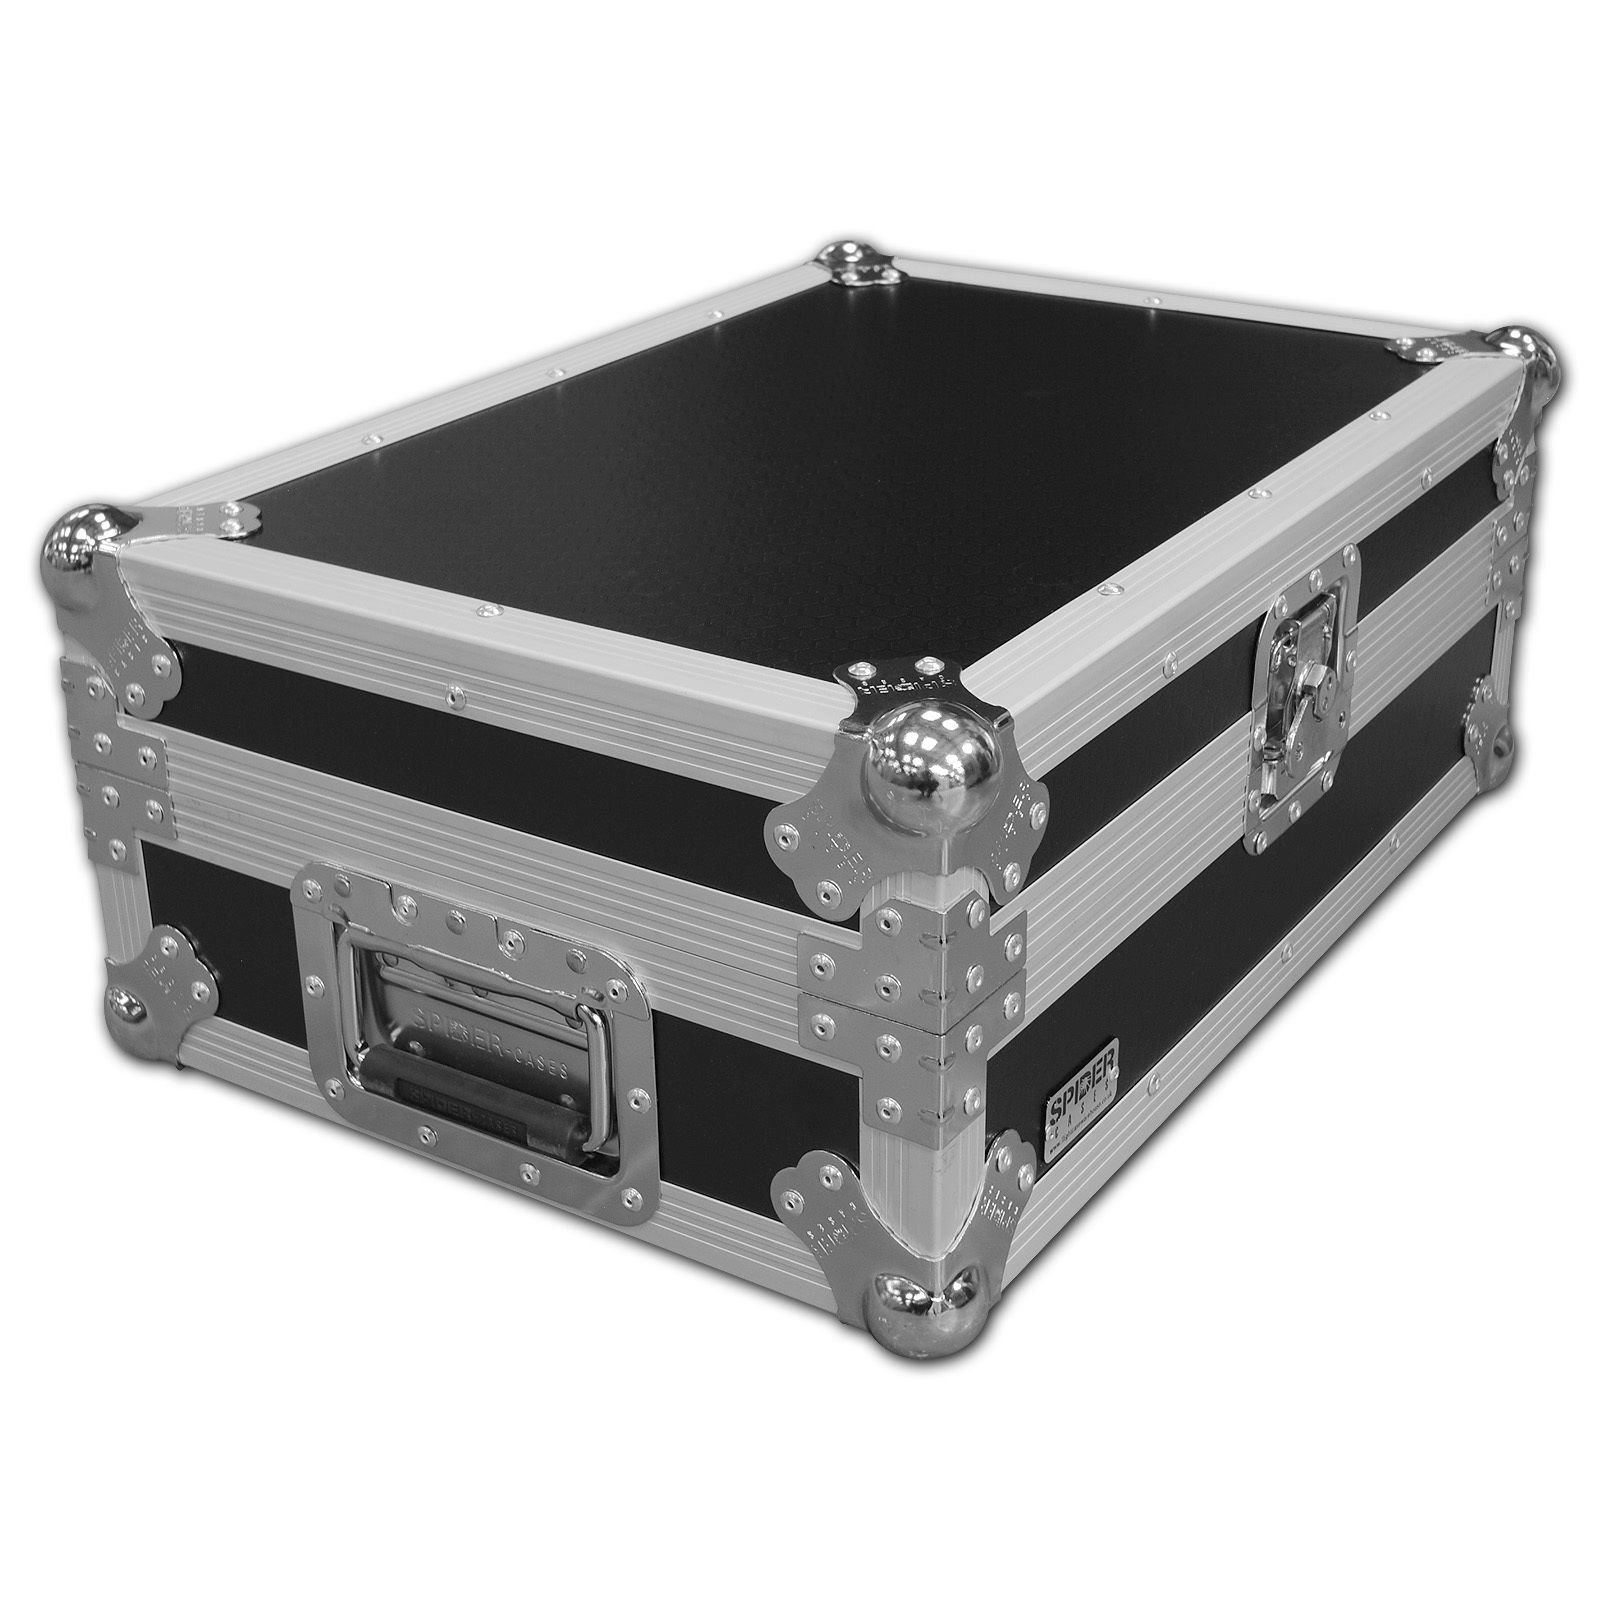 spider pioneer djm 600 dj mixer flight case. Black Bedroom Furniture Sets. Home Design Ideas